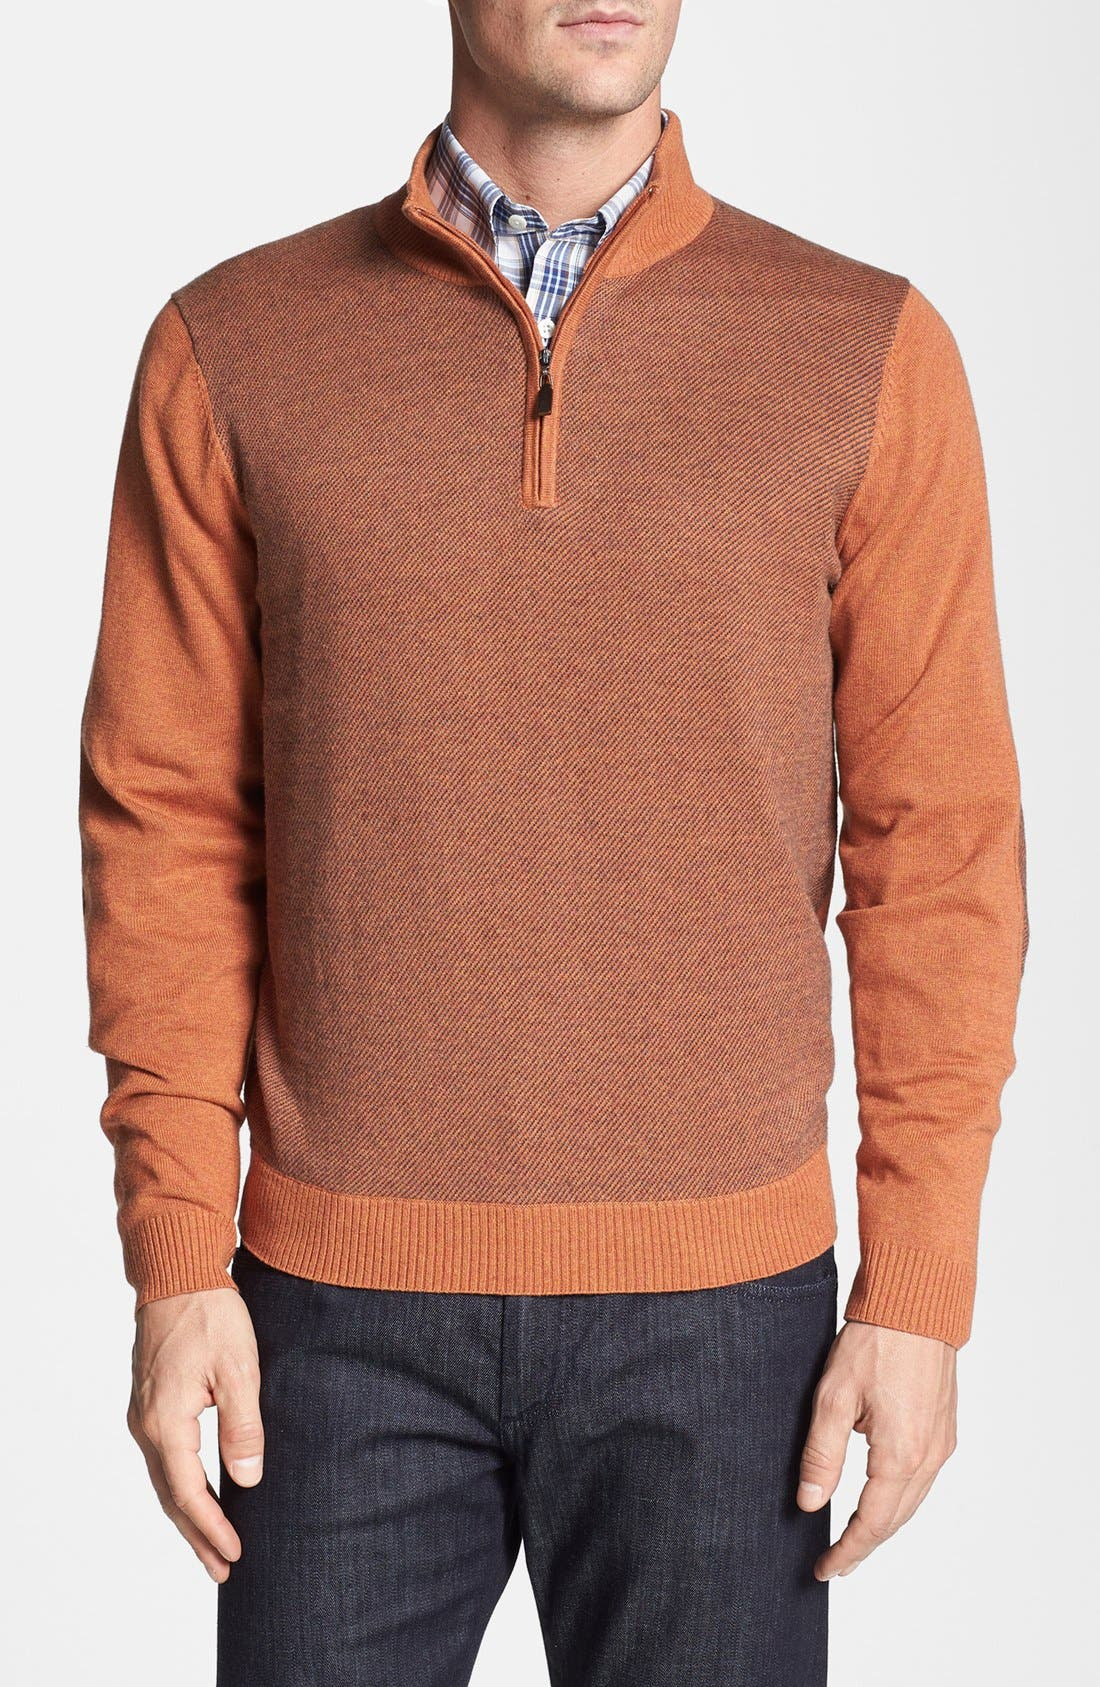 Alternate Image 1 Selected - Robert Talbott Jacquard Quarter Zip Sweater